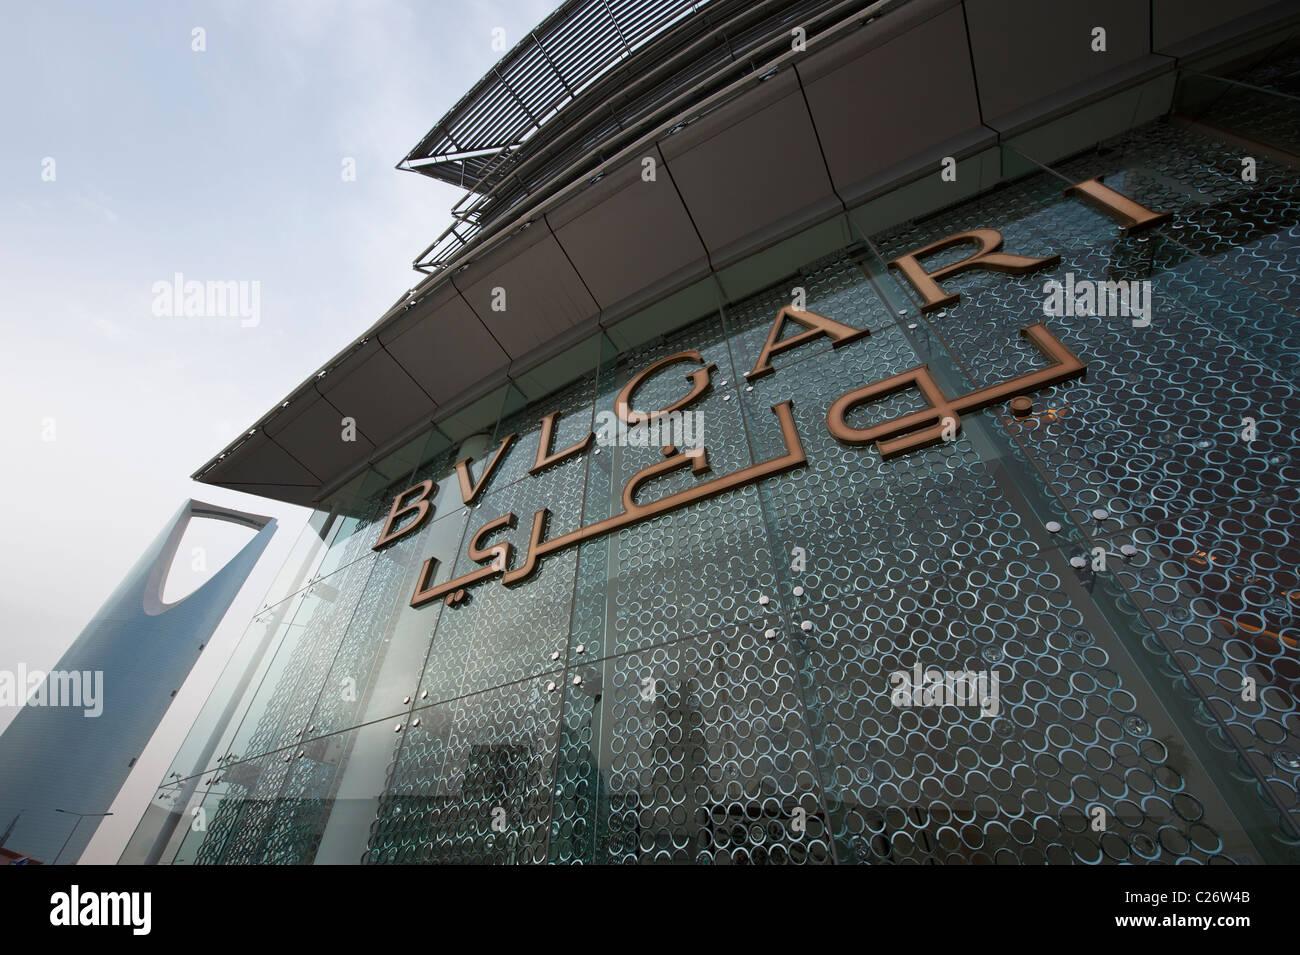 Kingdom Tower et Bulgari Boutique dans Riyadh, Arabie Saoudite Photo Stock